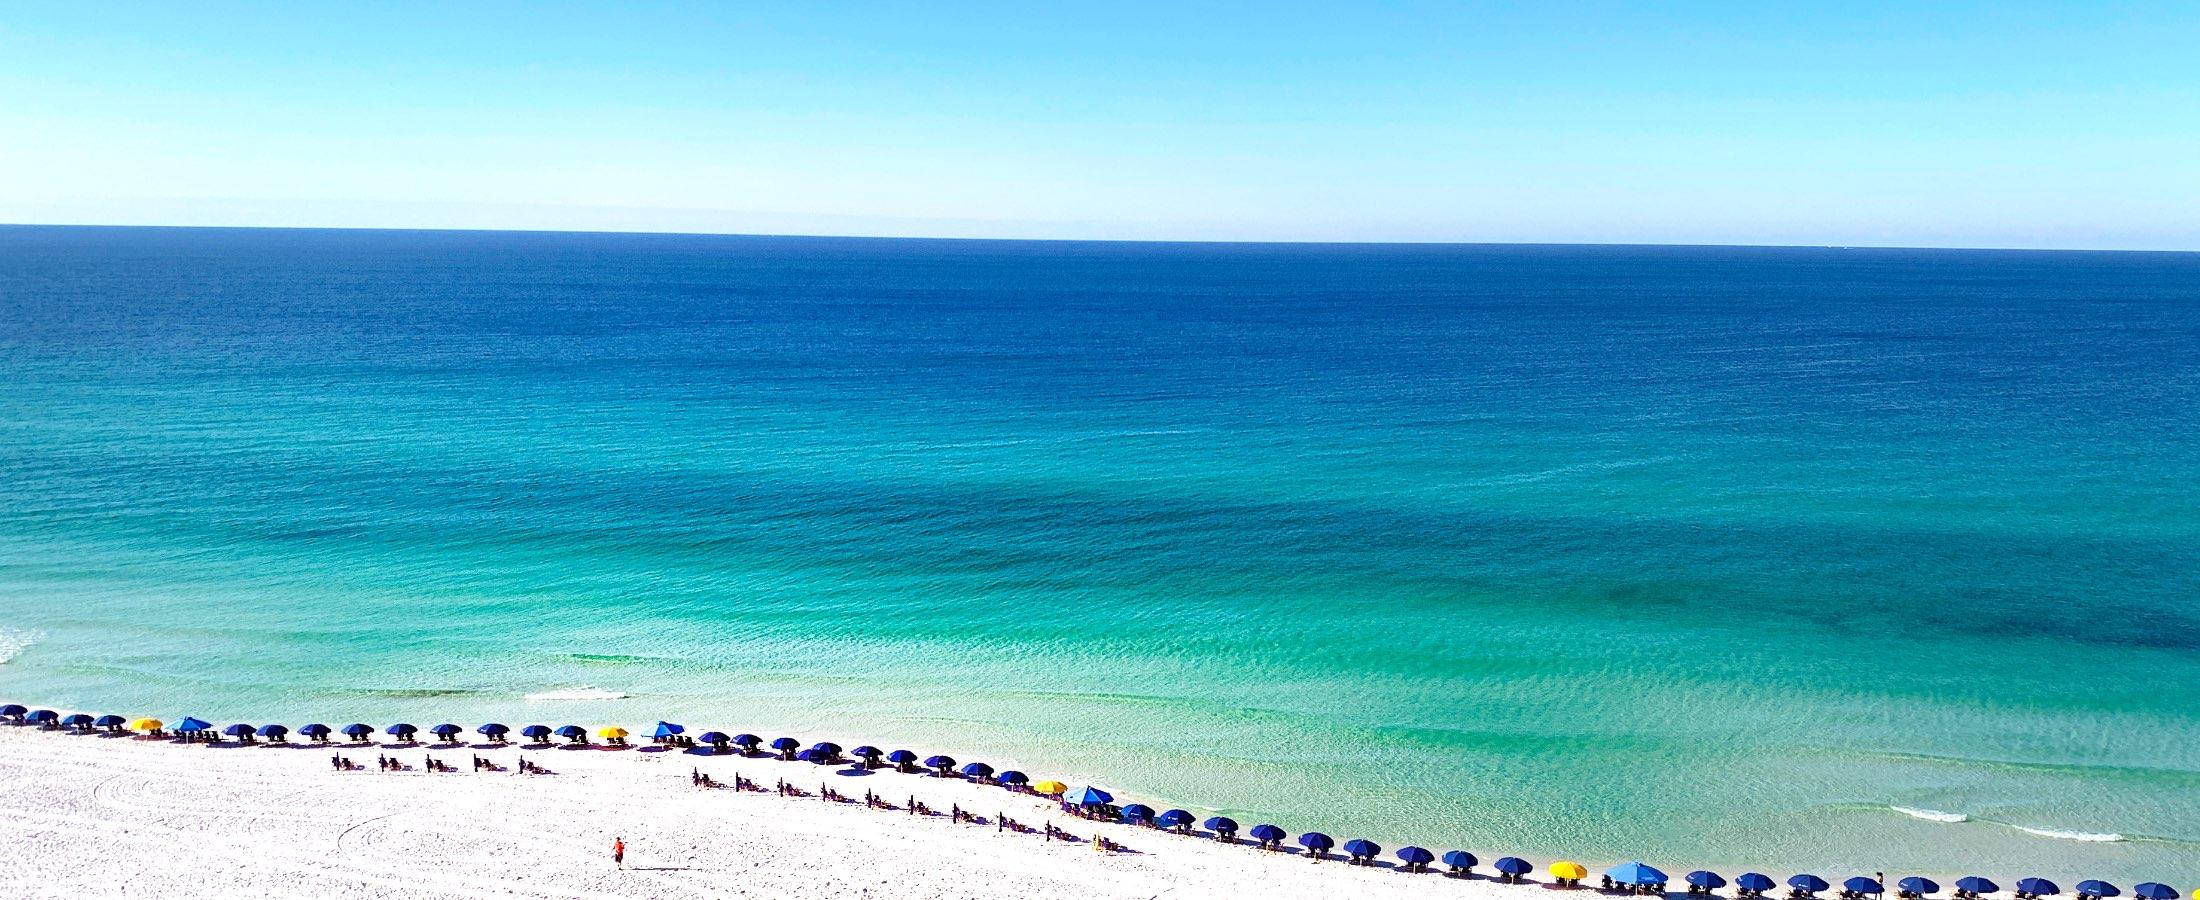 Seascape Resort Destin Condo Rentals